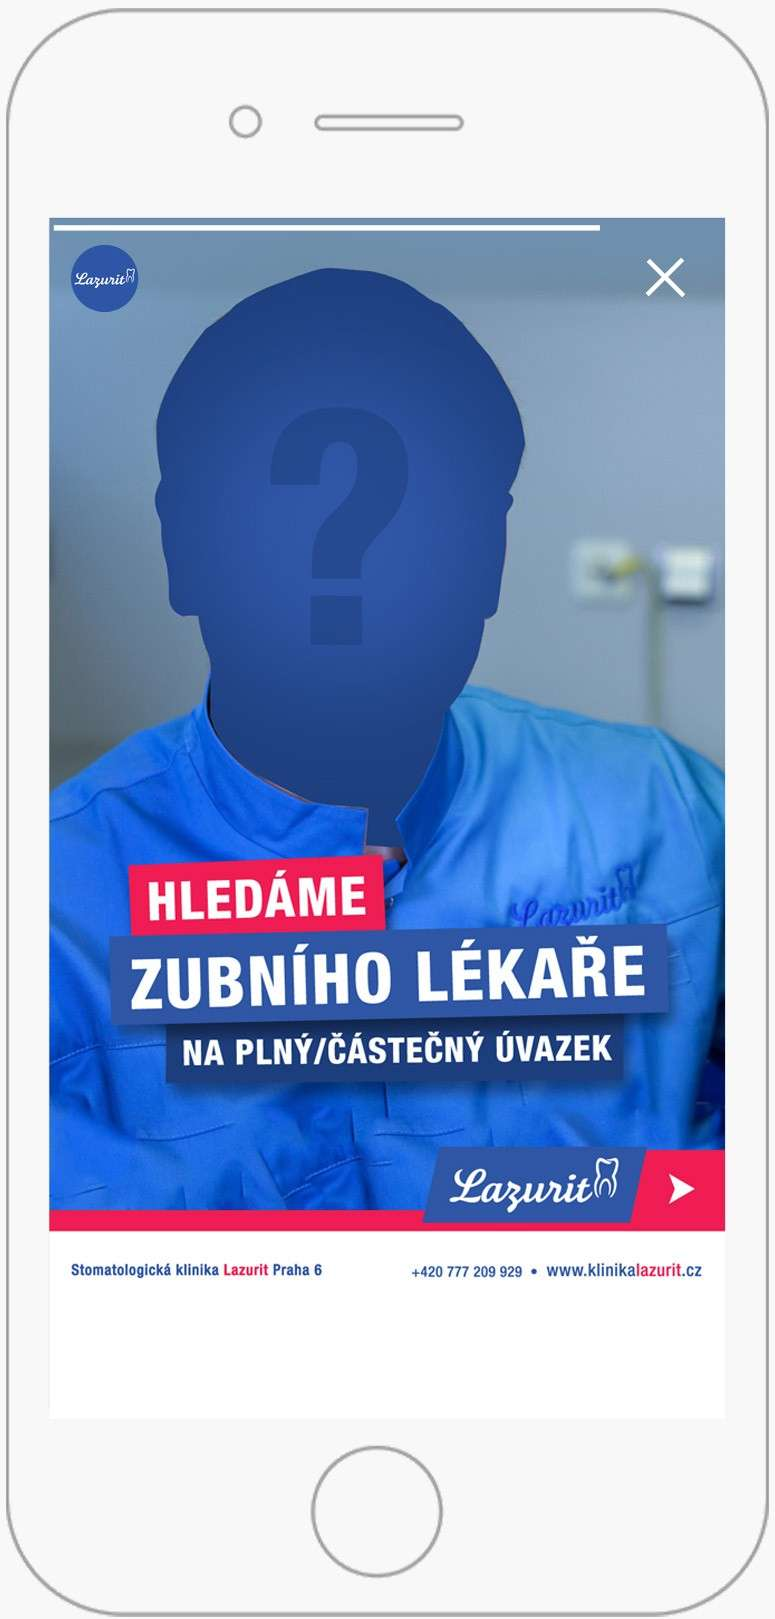 clubadvisor_reference_klinika-lazurit_on-line-marketing_instagram-single_1